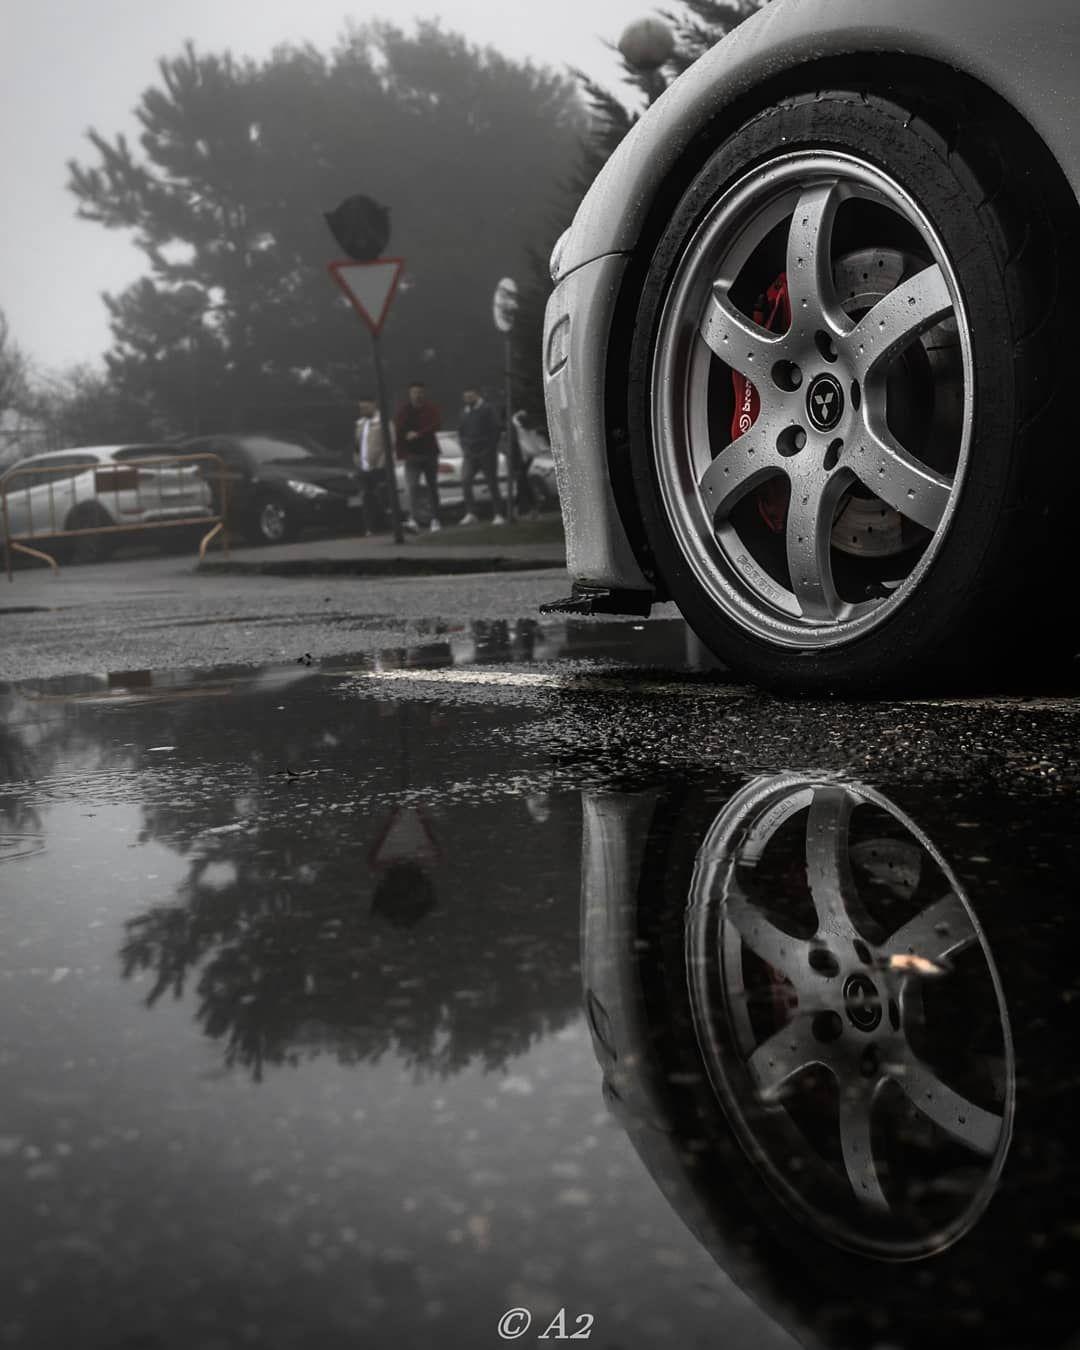 💧✨The rain Song.✨💧 🚗:@dsm_eclipse_white_forged_ . #mitsubishi #eclipse #mitsubishieclipse #mitsu #4g63  #eclipsegsx #dsm #4g63t #evo #rays #photographyamateur #photo #photographer #photocar #photooftheday #jdmlife #jdm #rain #dark #reflection #mirror